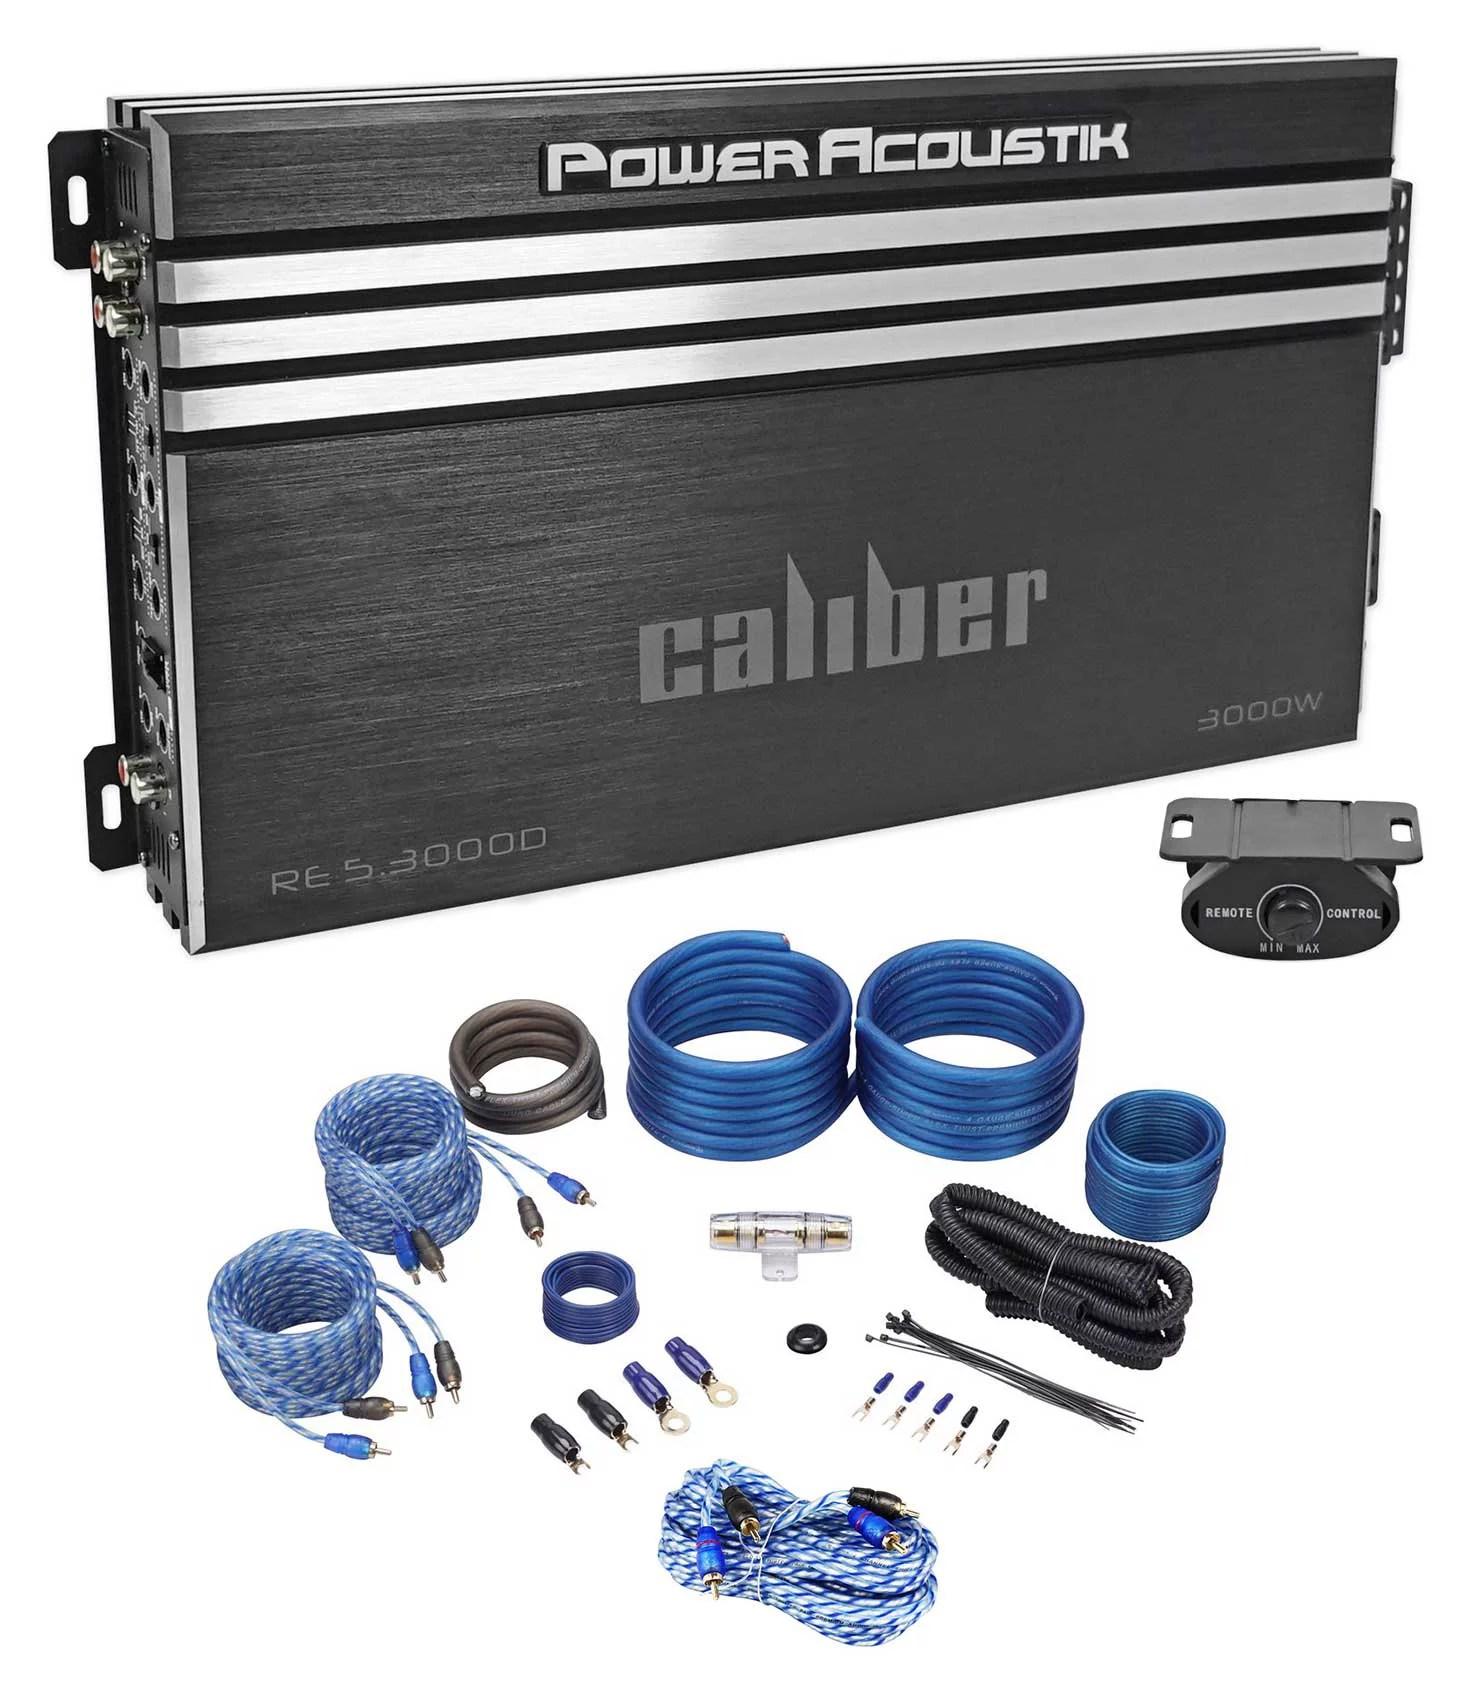 small resolution of power acoustik re5 3000d 3000w 5 channel car audio amplifier class a power acoustik akit8 amplifier wiring kit 8gauge walmartcom